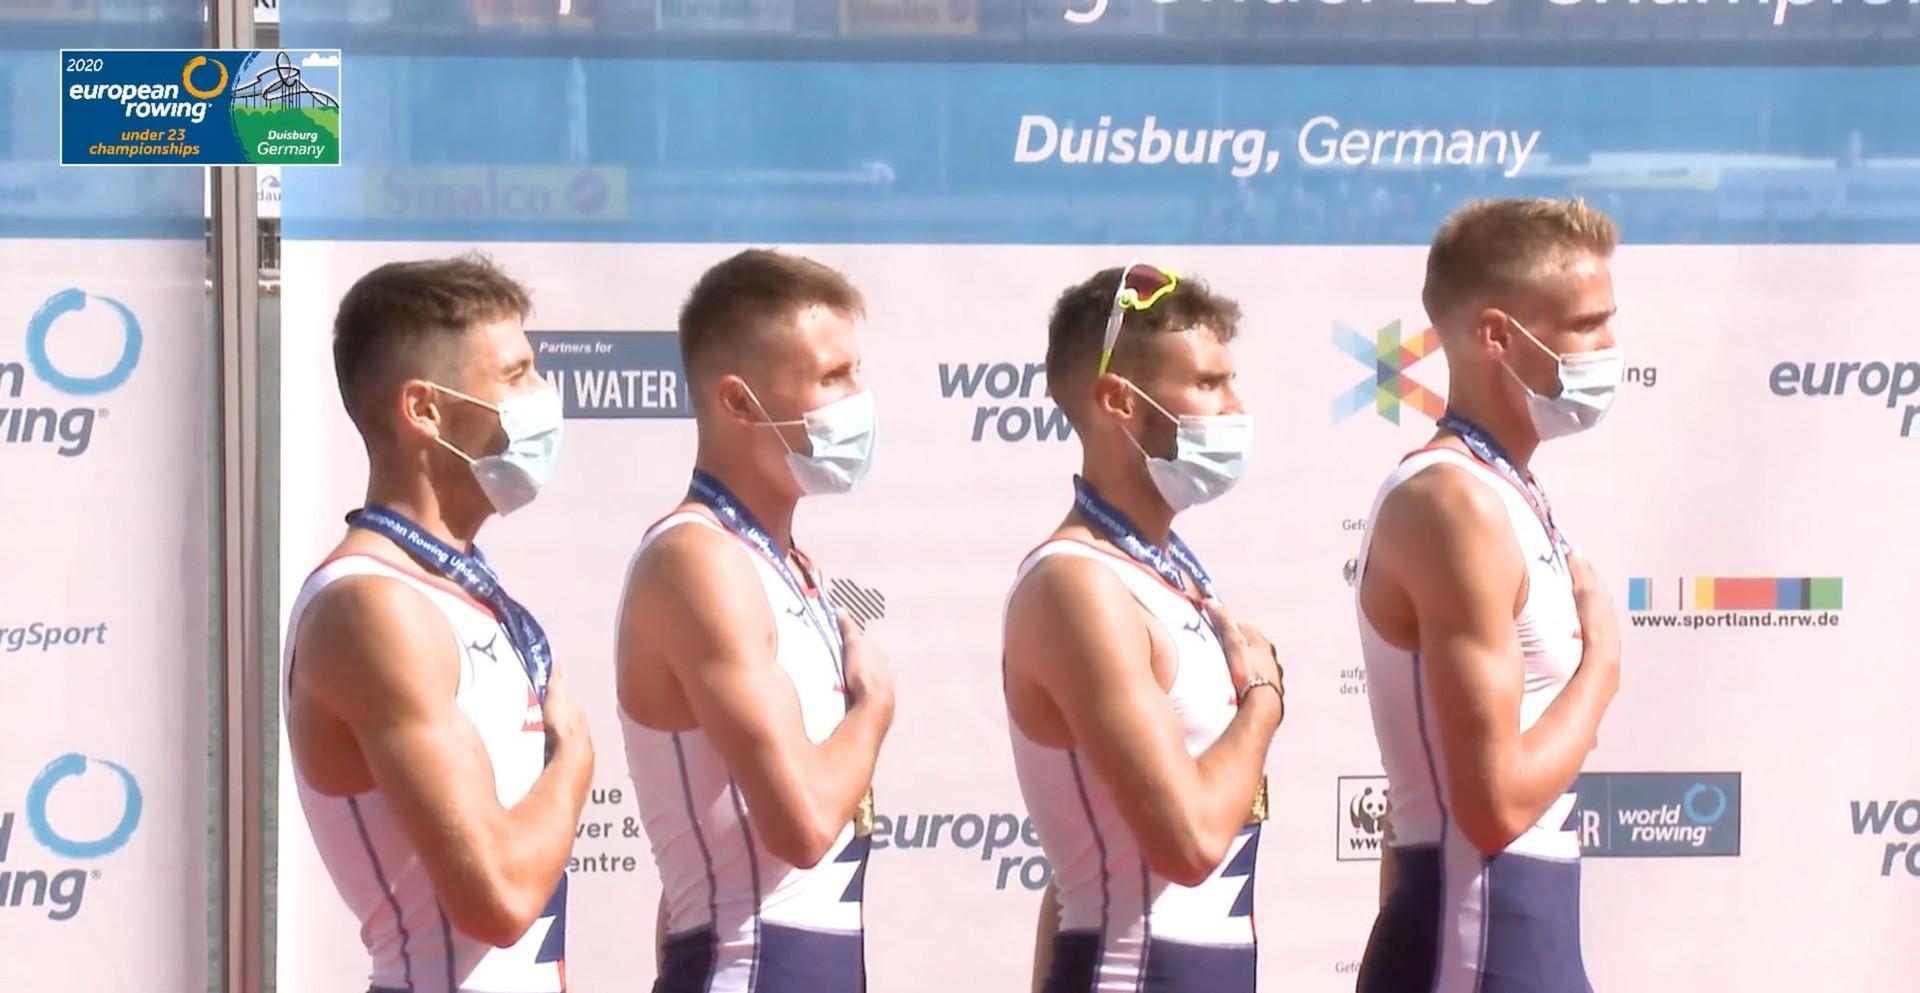 4XHPL-Champions d'Europe U23